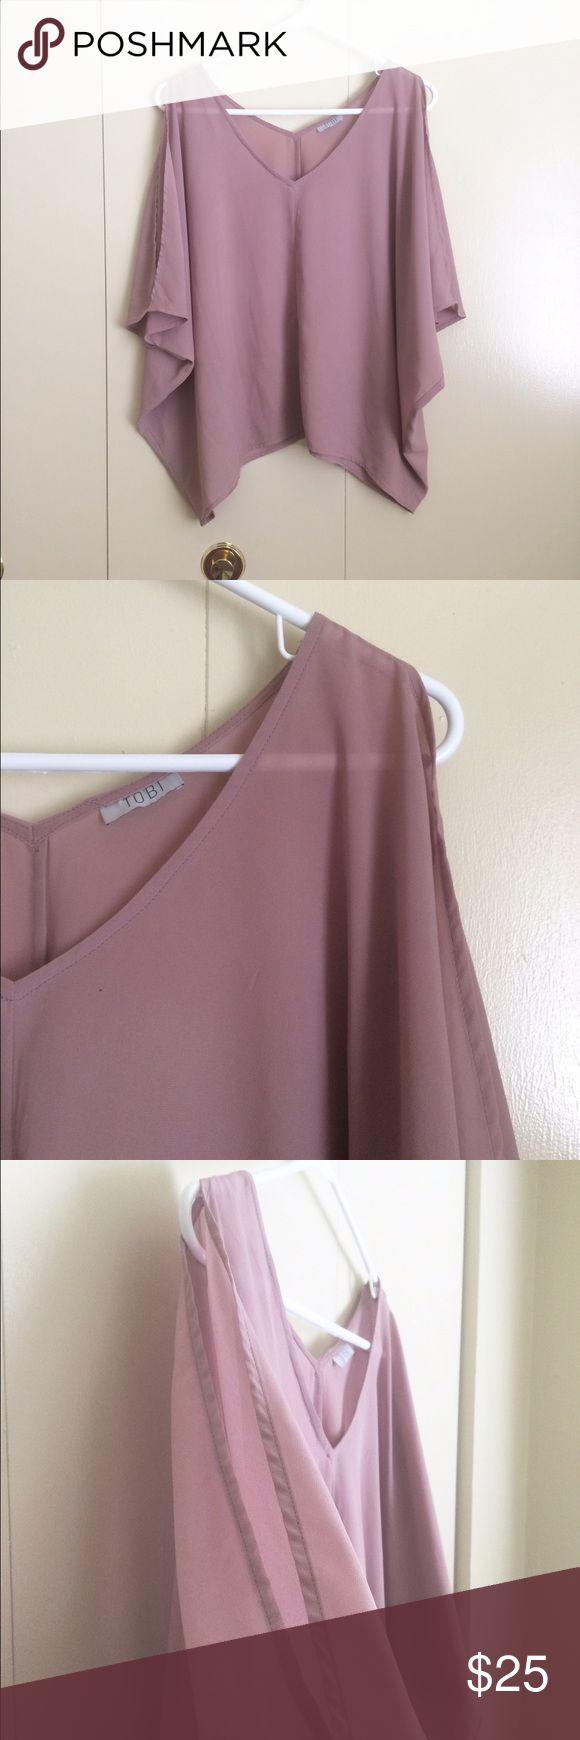 Lilac Tobi Open Shoulder Chiffon Top Light dusty purple drapey top, slits in the sleeves, sharkbite hemline Tobi Tops Blouses